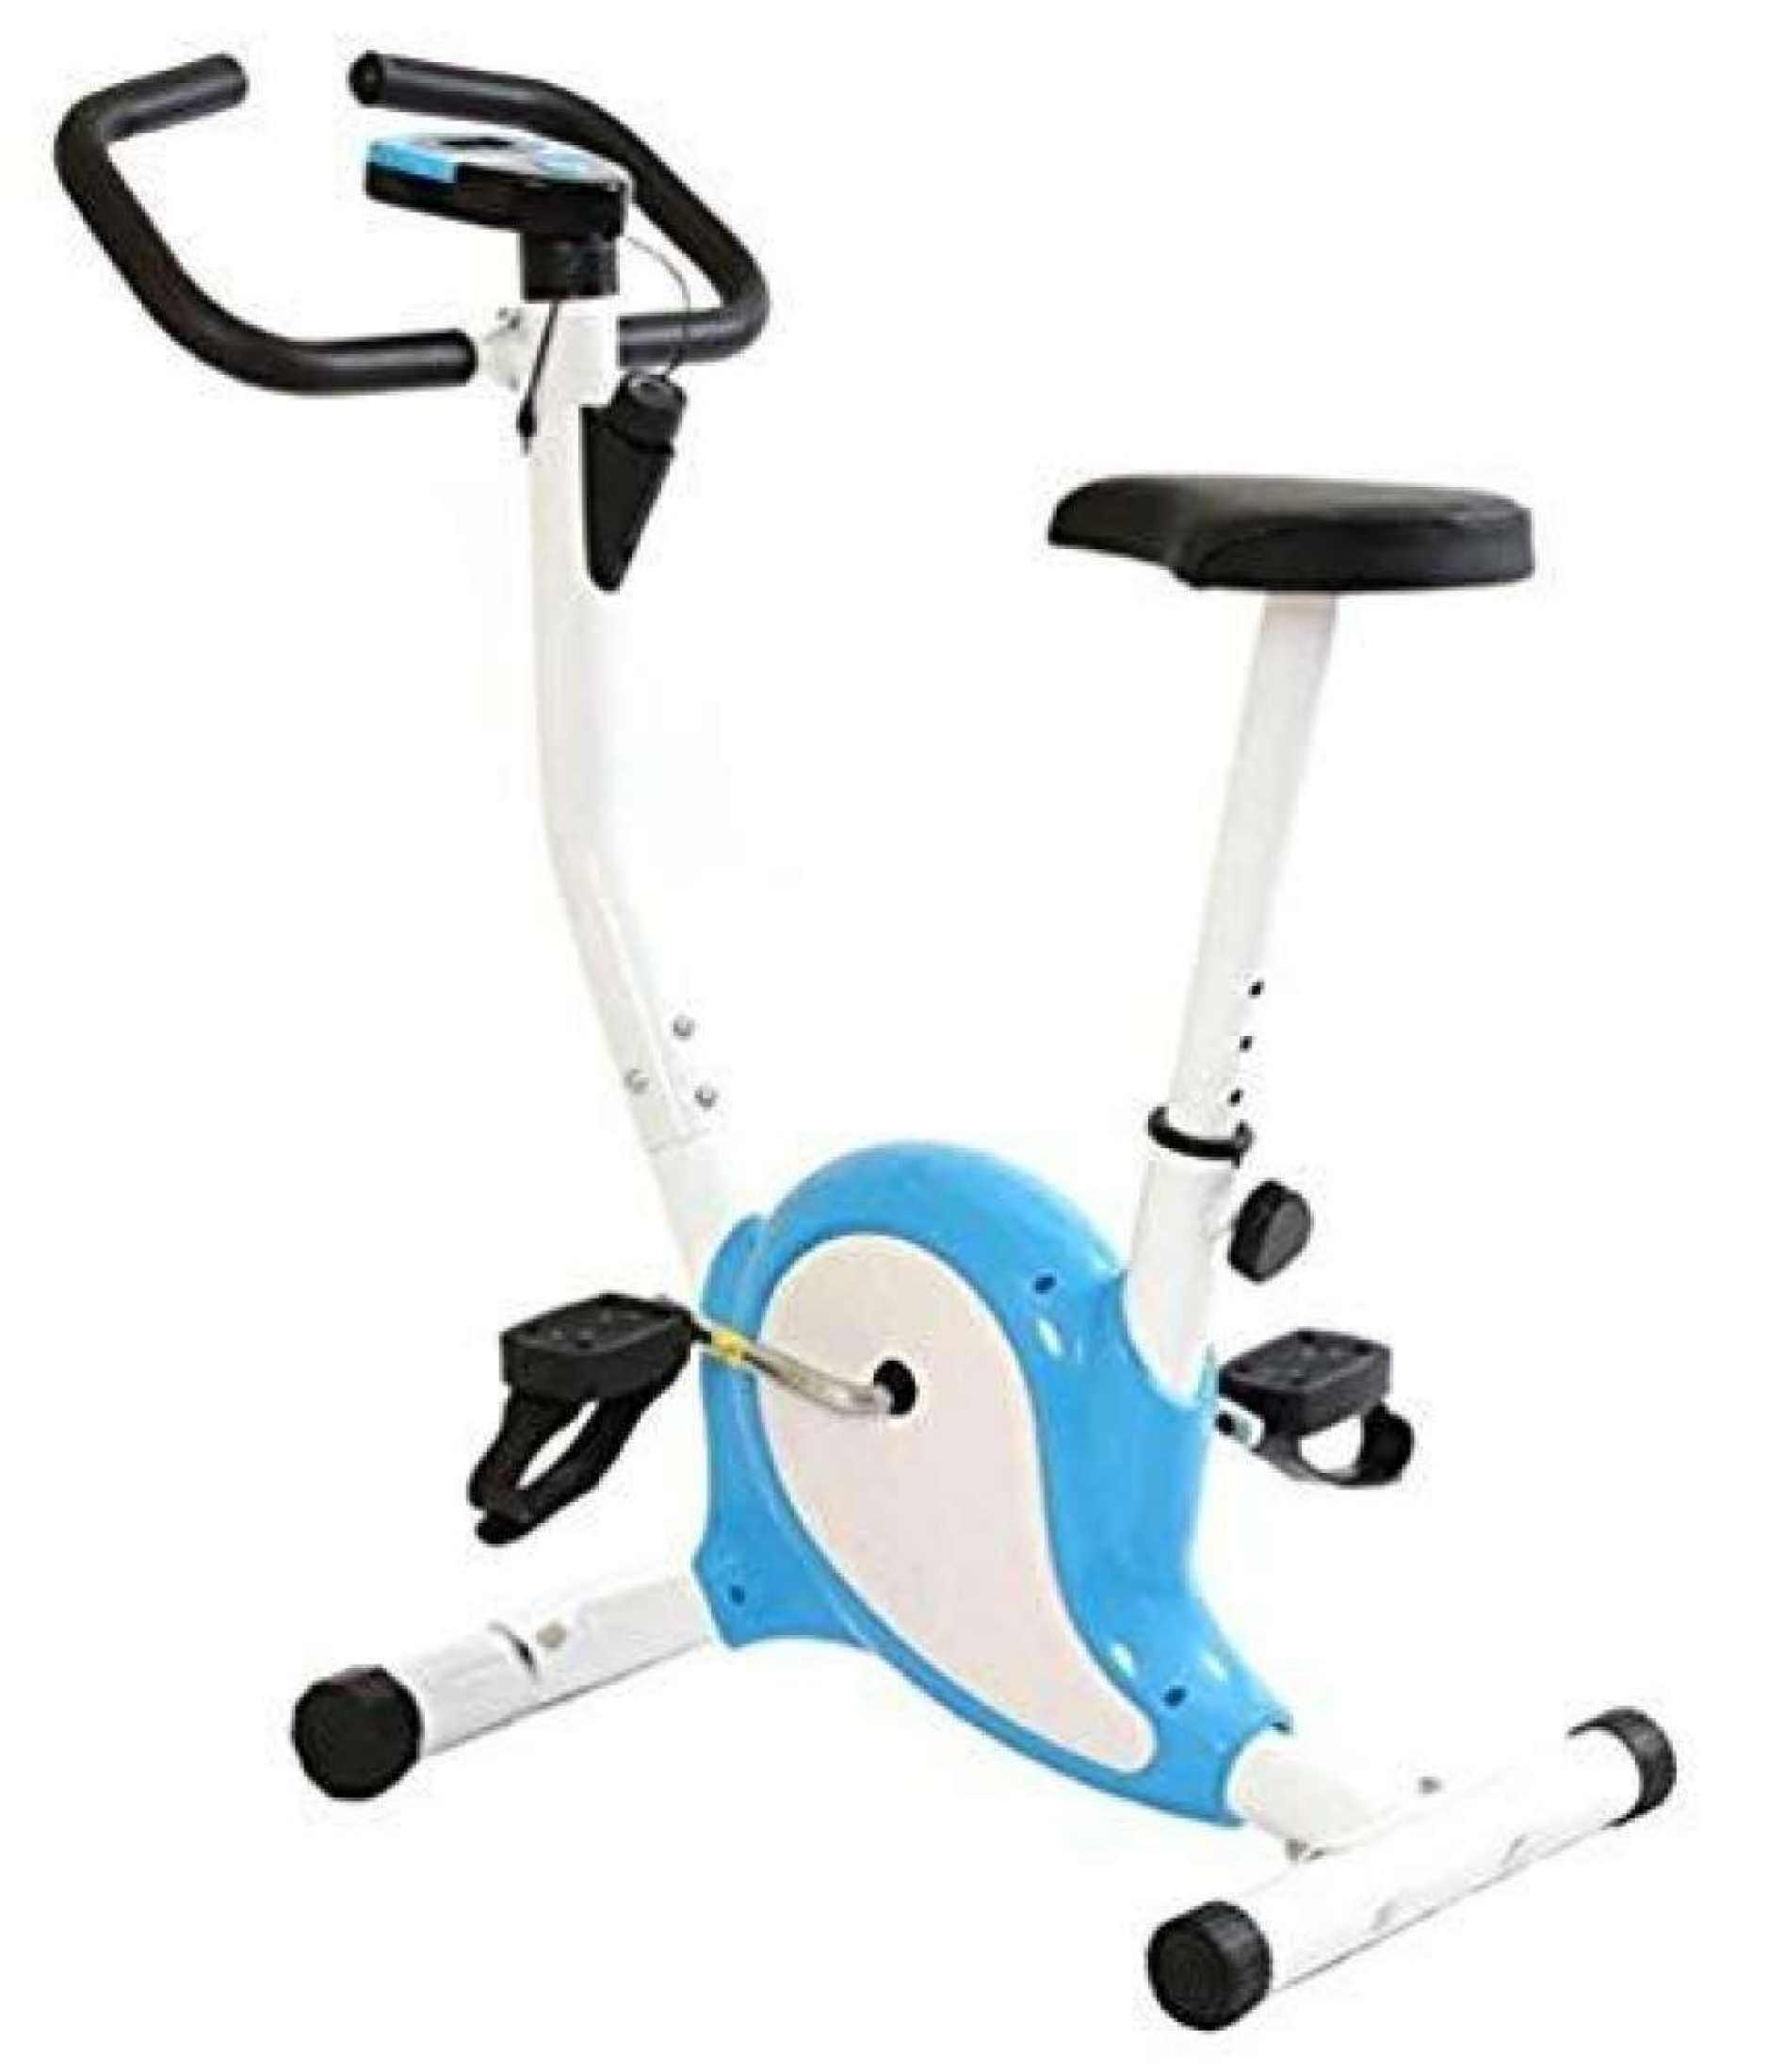 Aerobic Training Exercise Bike Fitness Cardio Workout Cycling Machine